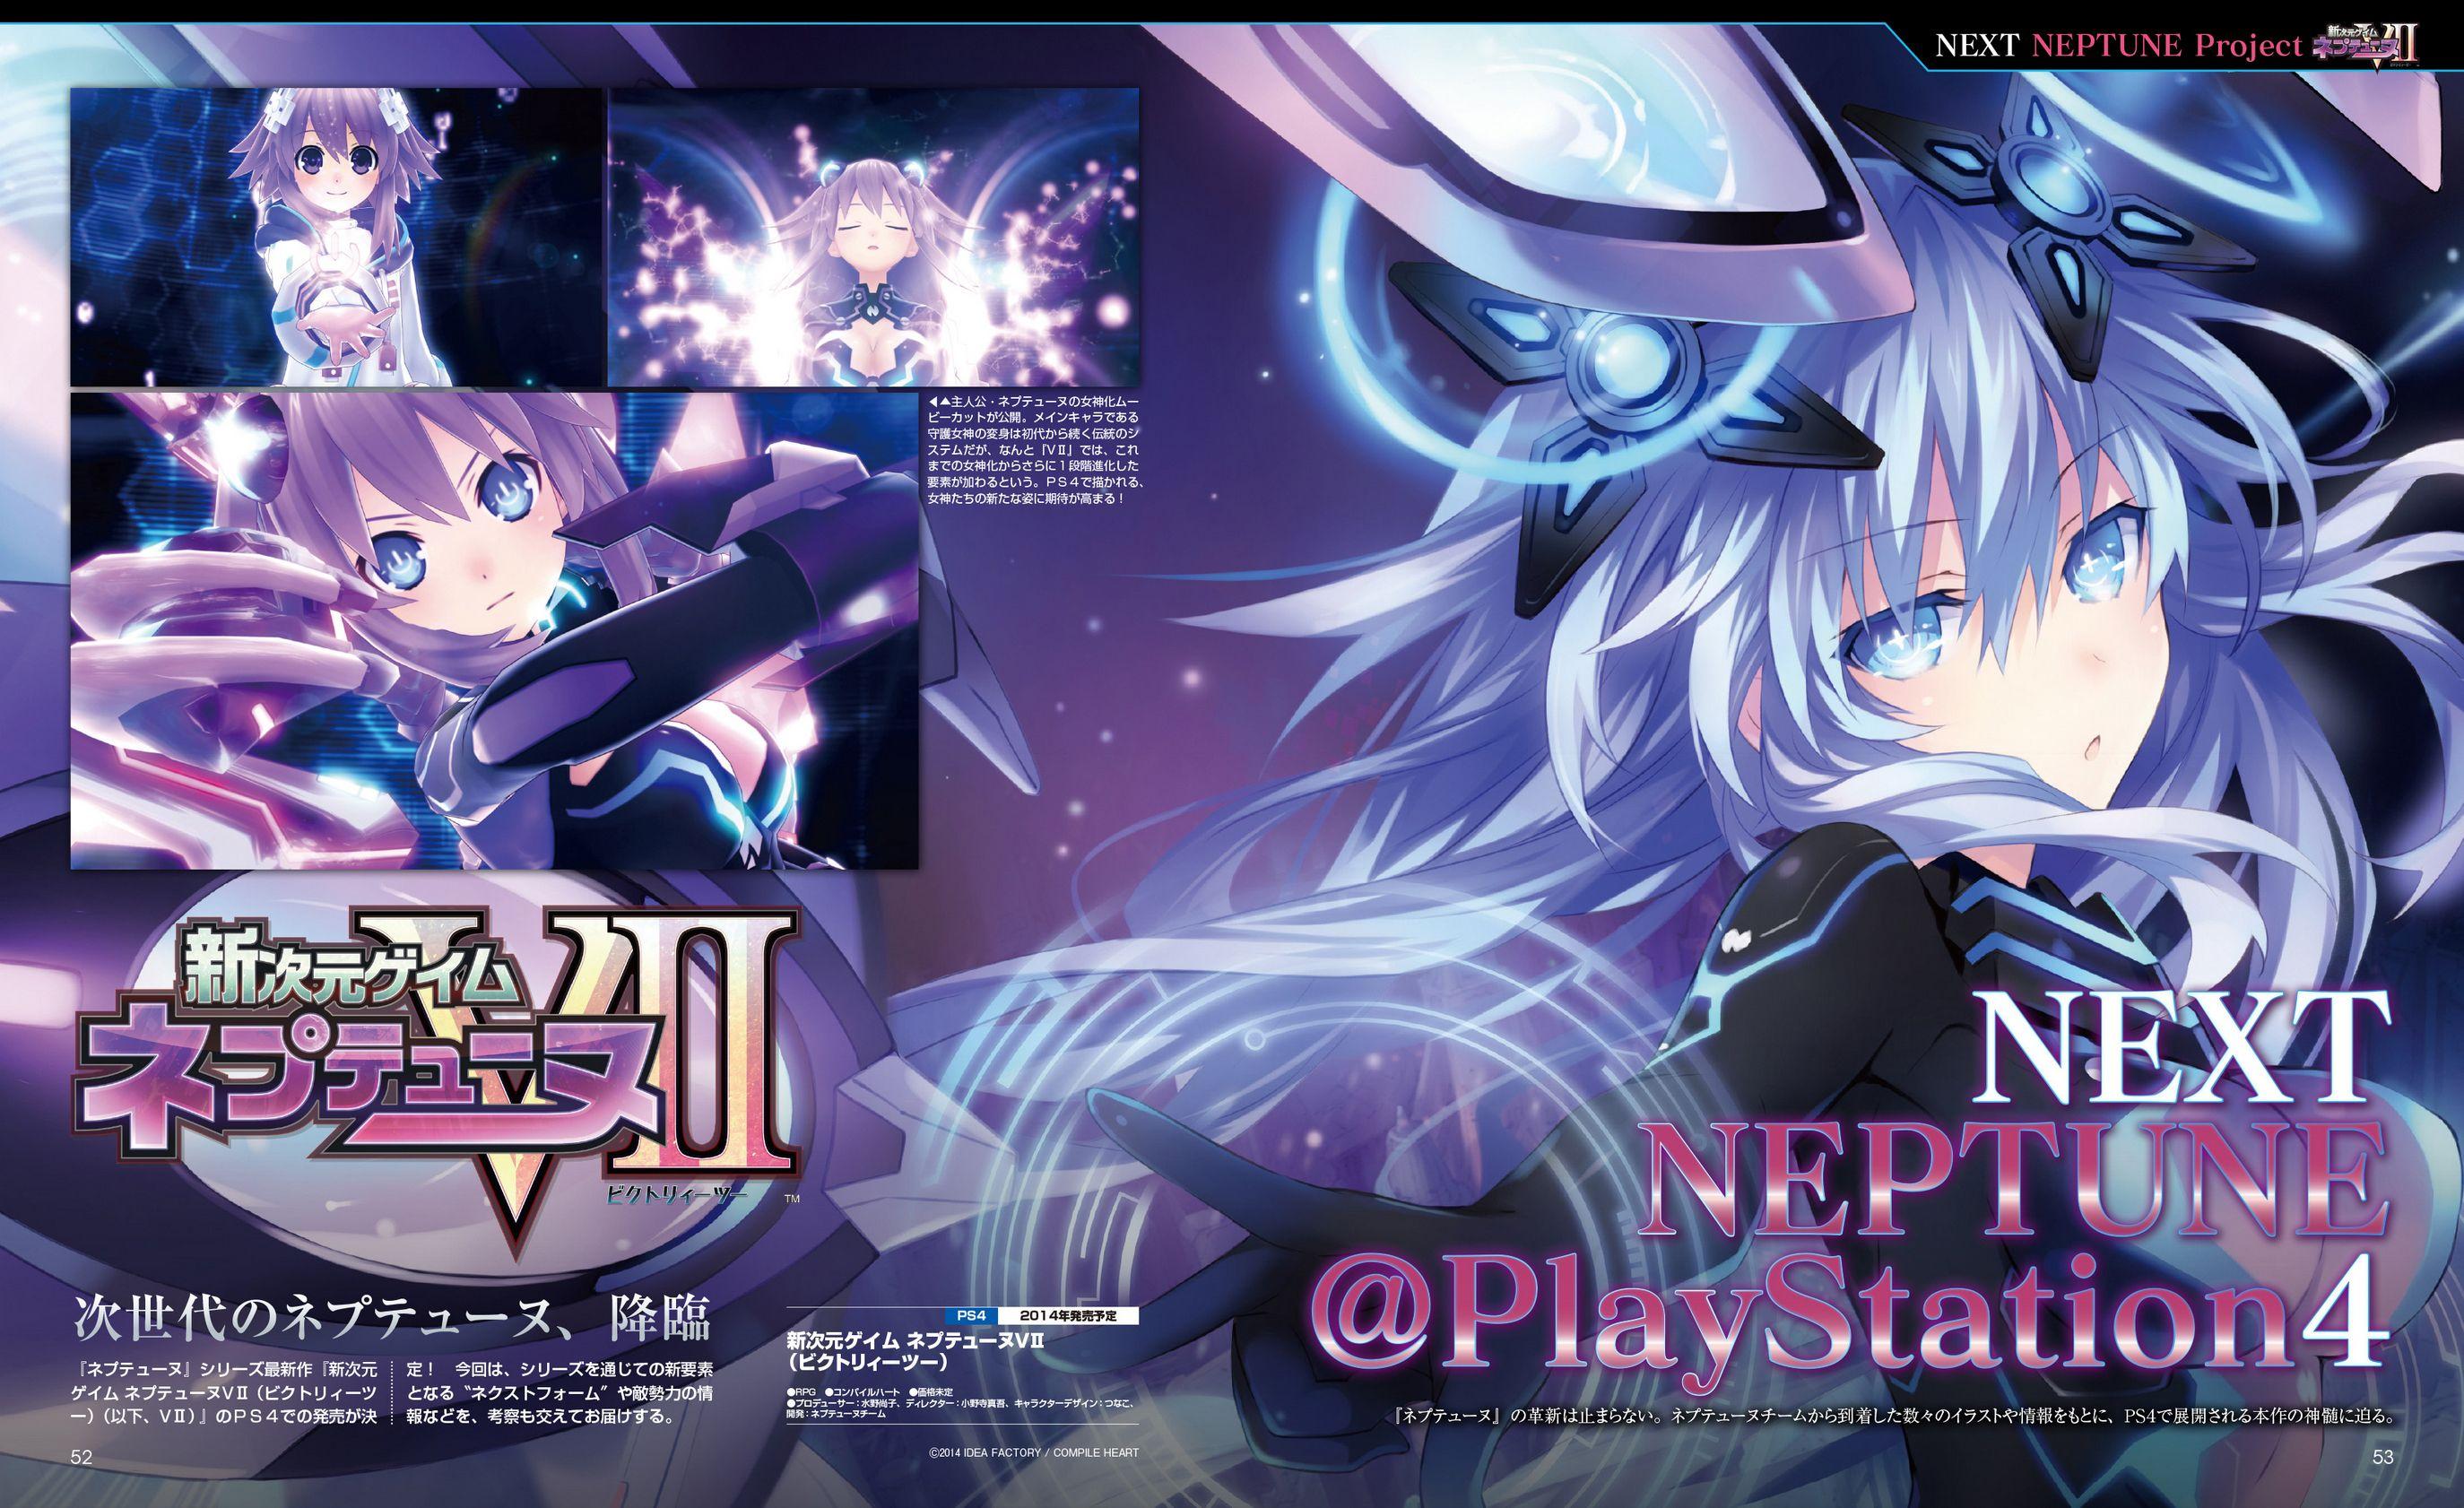 PS4 신차원게임 넵튠 VII 고화질 스켄샷